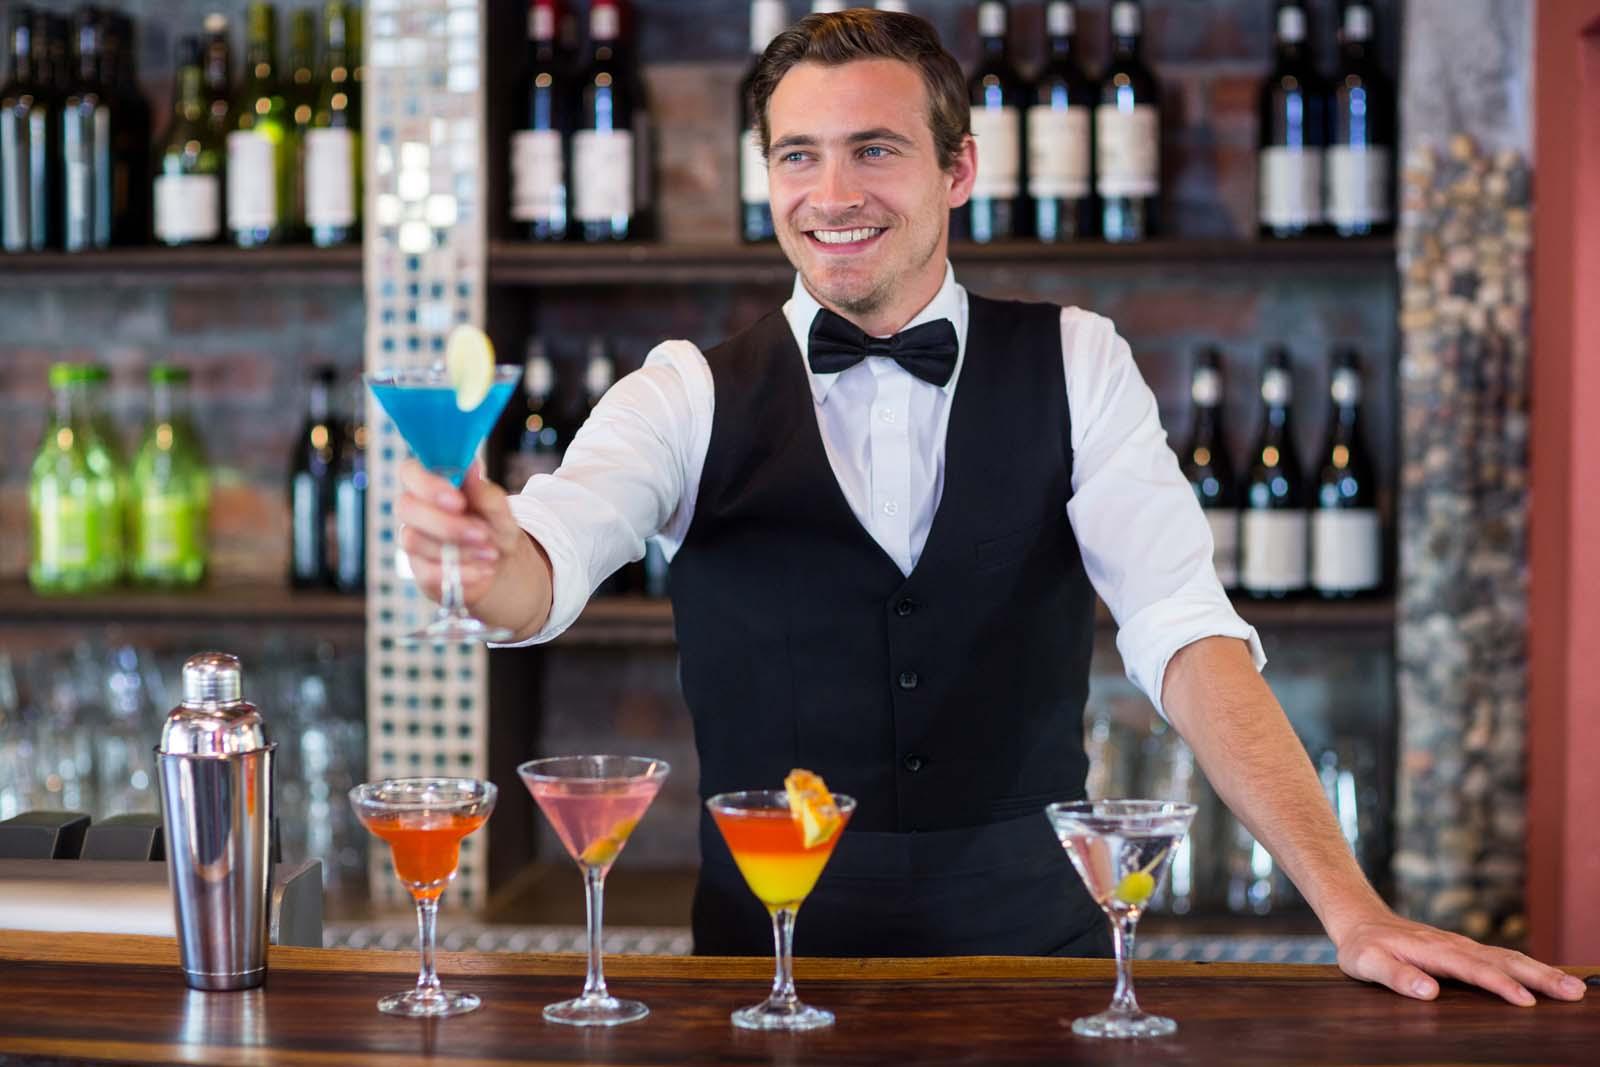 Bartender providing mixed drink to customer